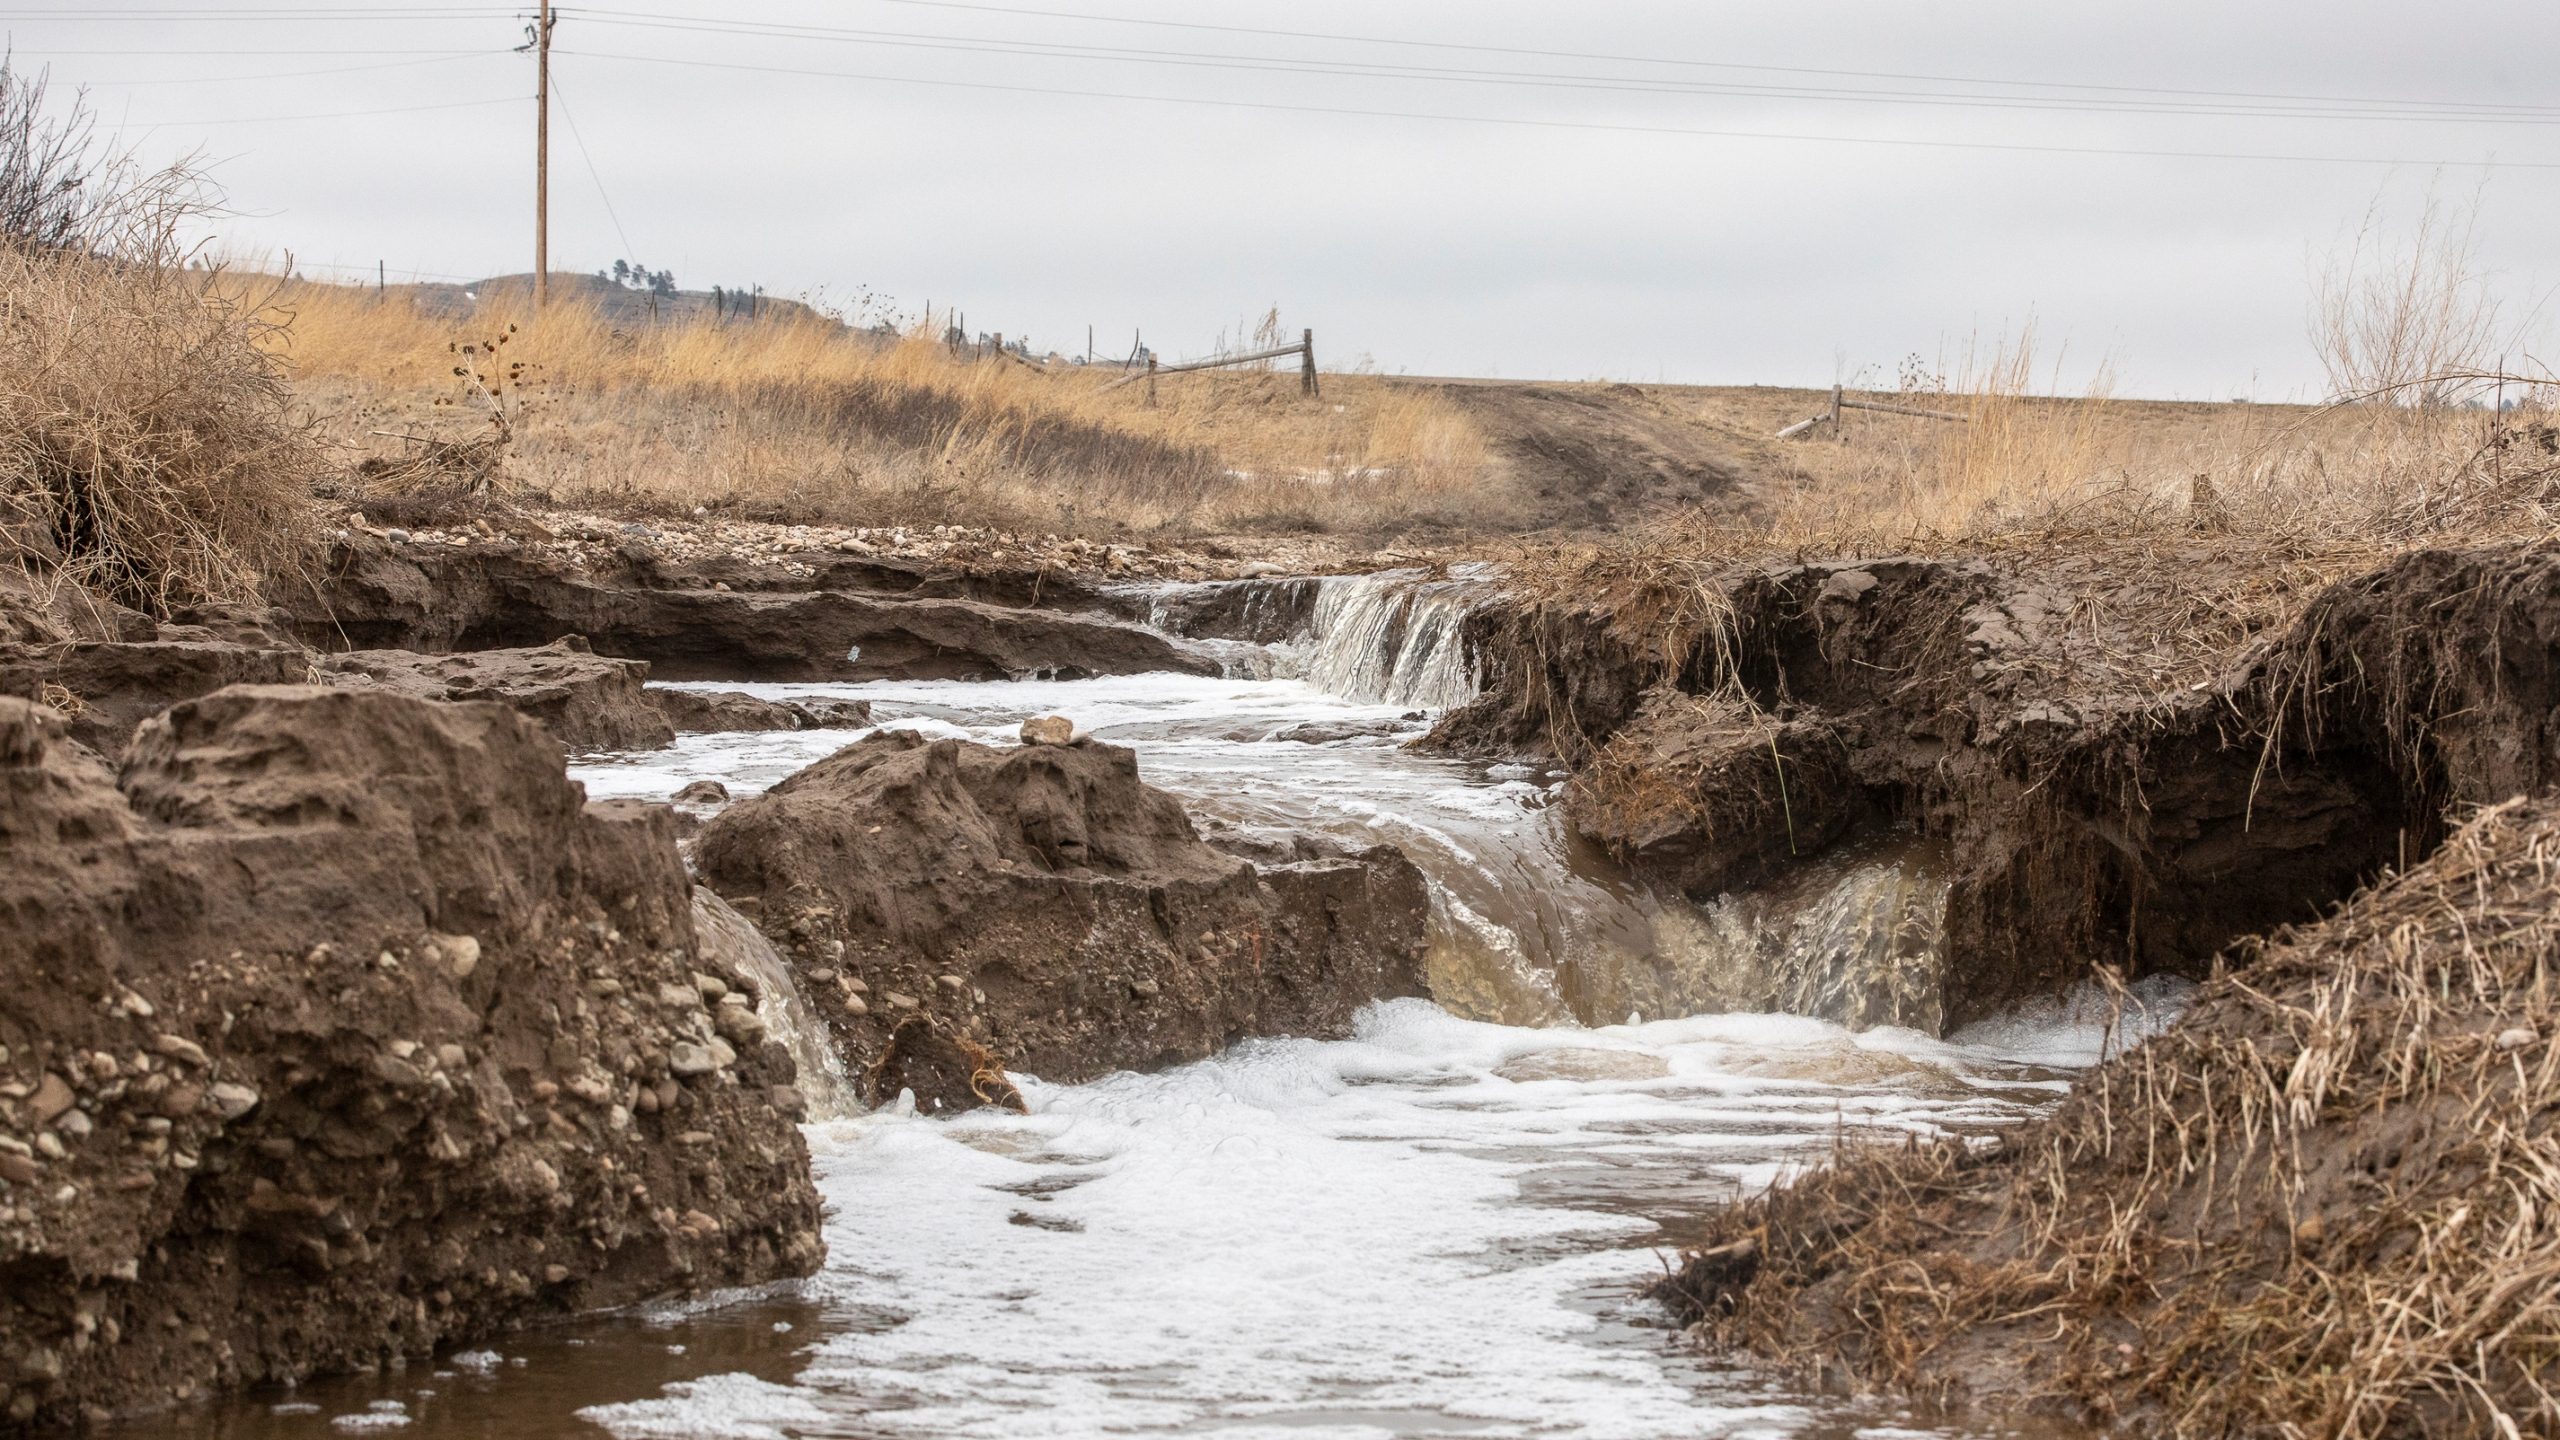 Spring_Flooding-South_Dakota_77319-159532.jpg84195646